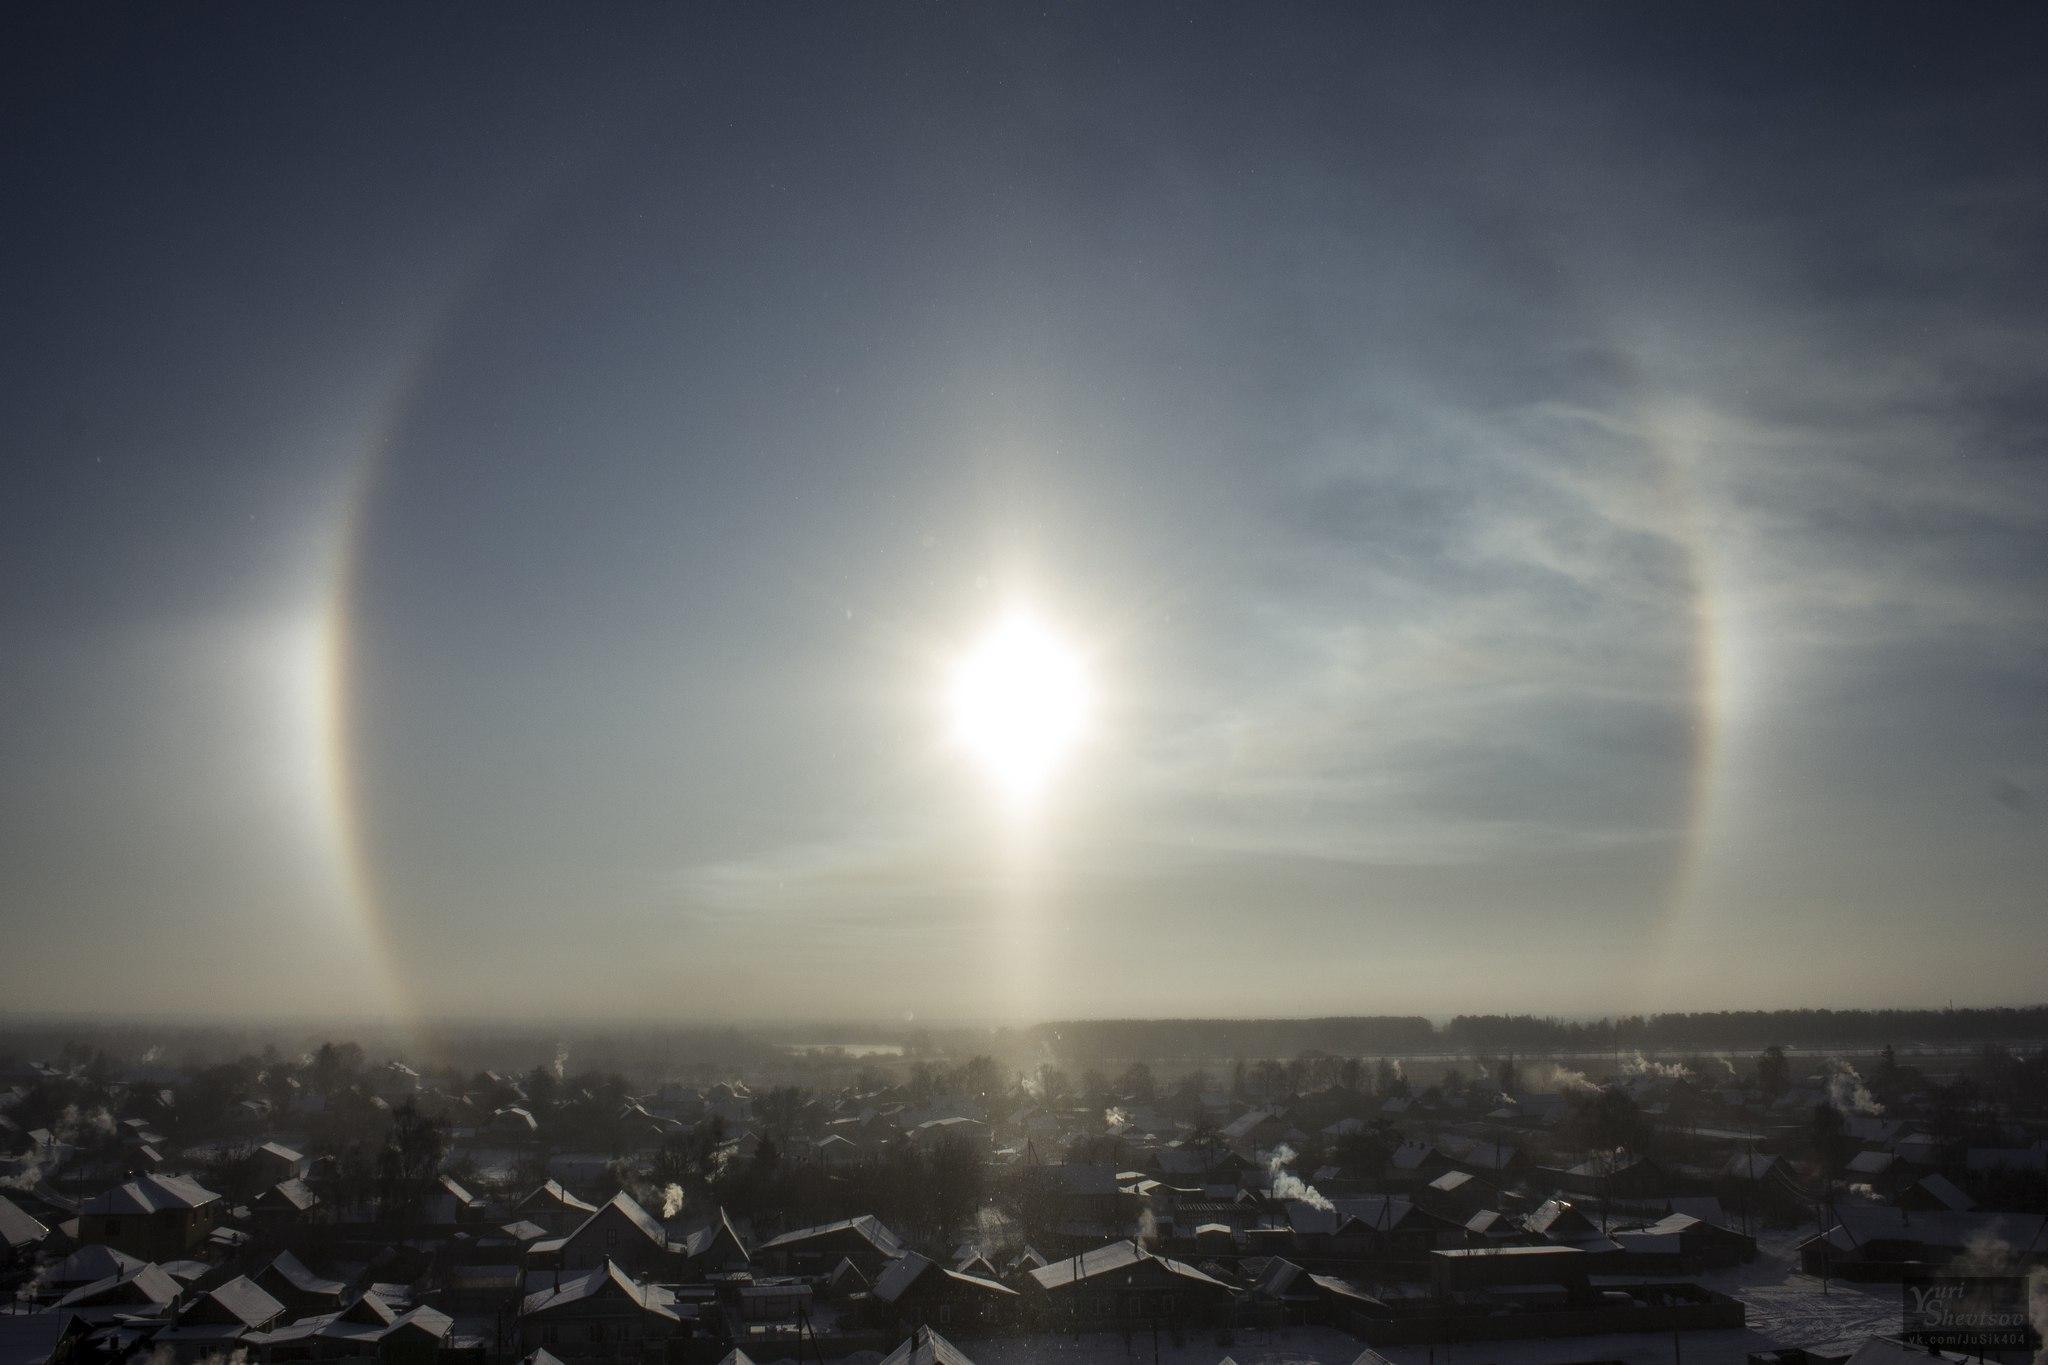 three suns galo belarus phenomenon belarus, three suns appear in the sky of belarus, sundogs belarus, sundogs 2016, sundogs january 2016, three suns galo belarus, parhelia january 2016, sundogs pictures january 2016